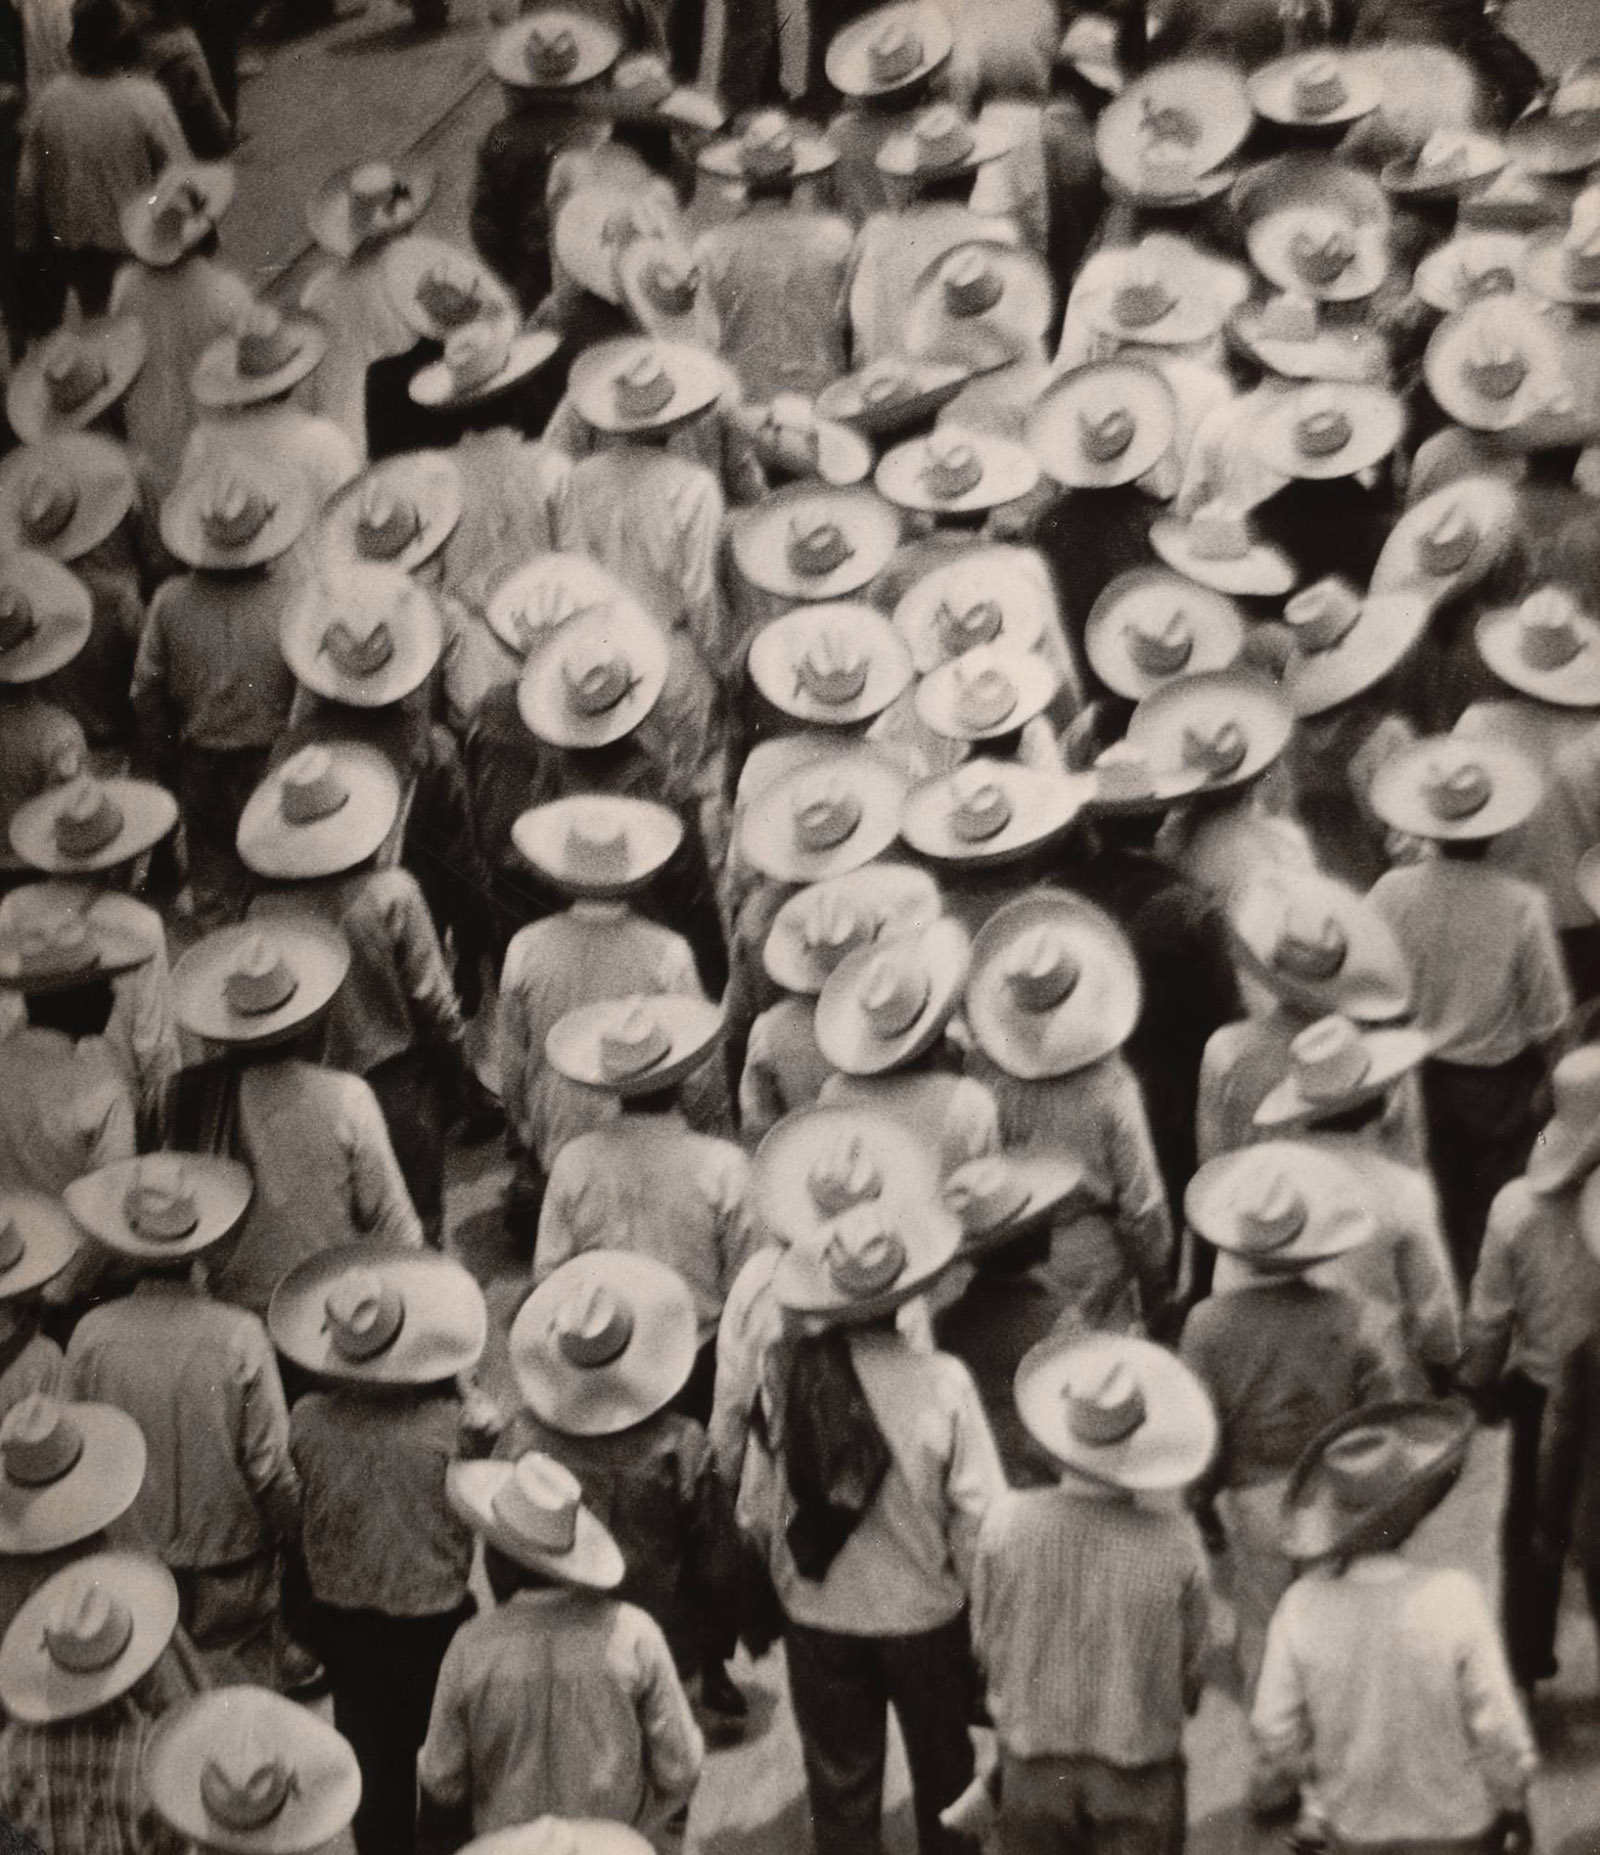 Worker's Parade, 1926; photograph by Tina Modotti